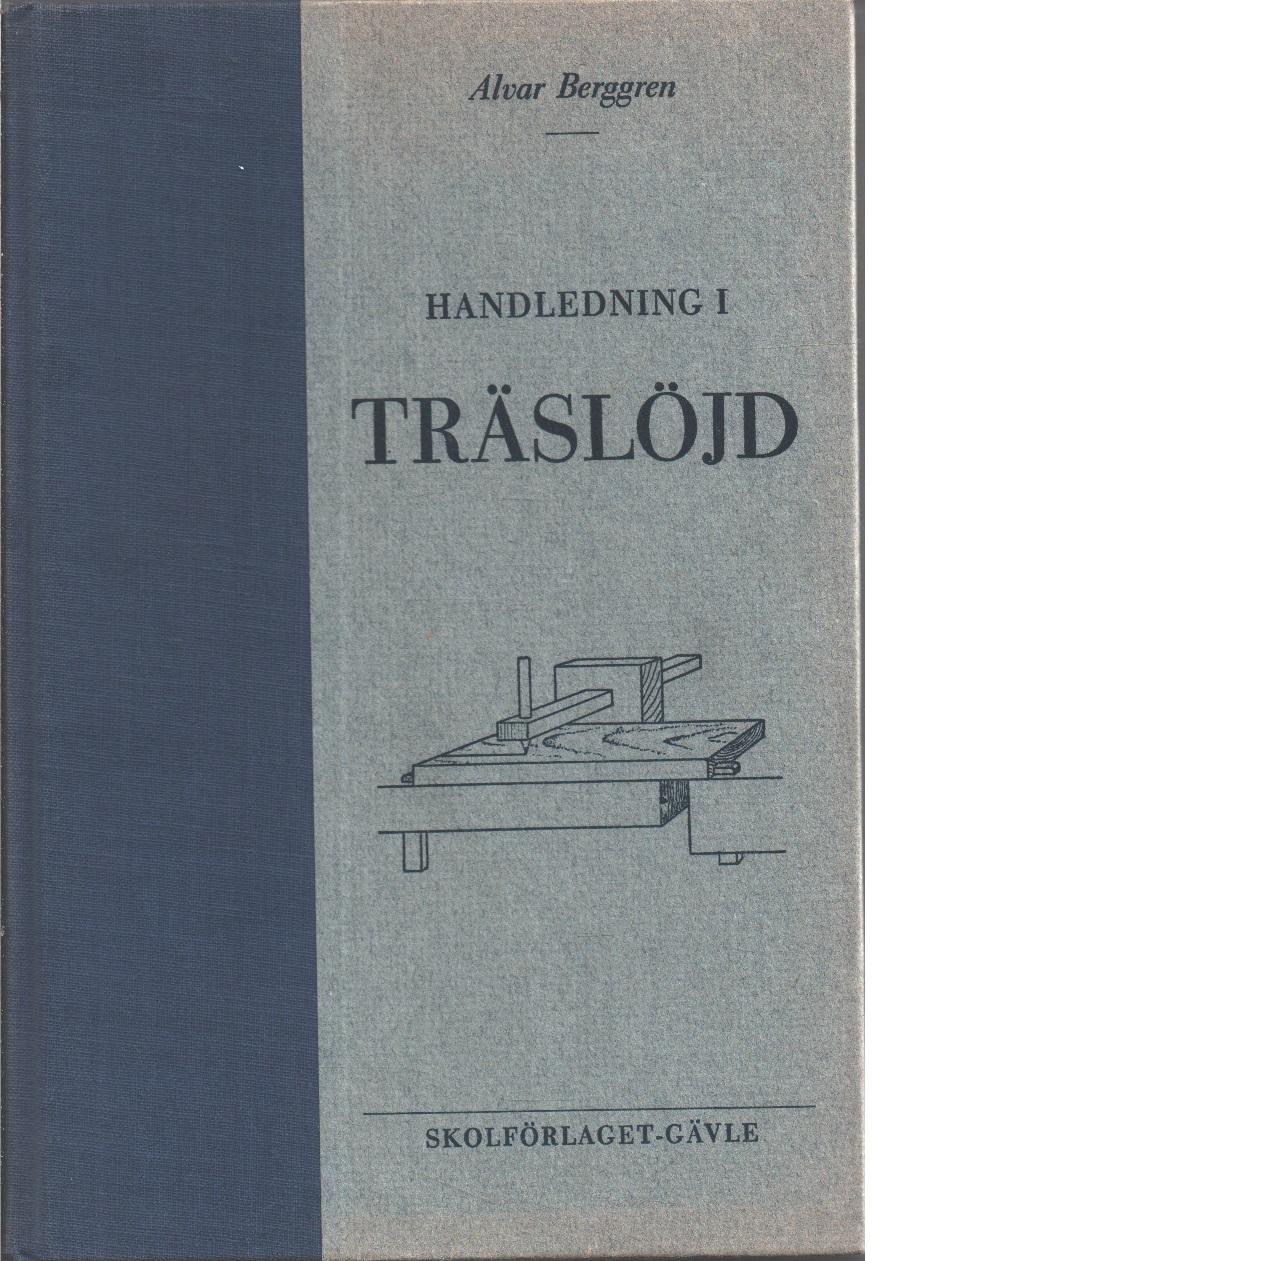 Praktisk handledning i träslöjd - Berggren, Alvar